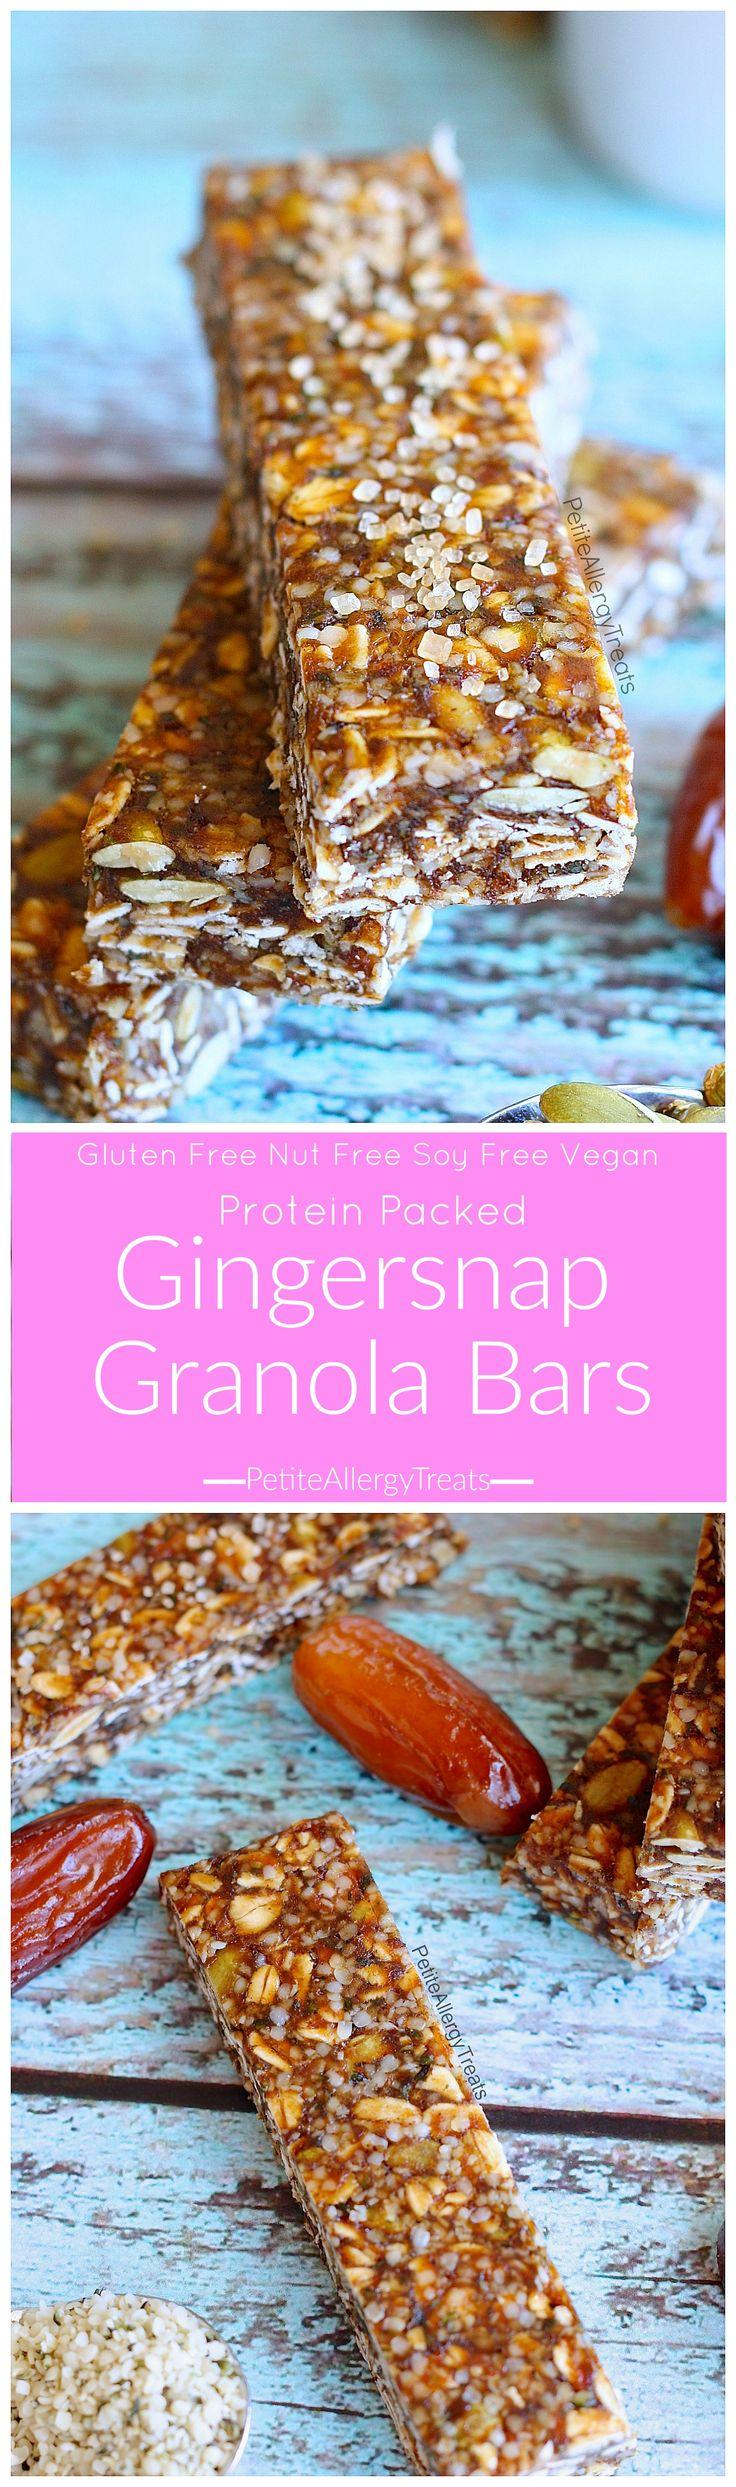 Protein Gingersnap Granola Bars Recipe (nut free Vegan)- Healthier gluten free protein packed gingersnap granola bars. Food Allergy Friendly.